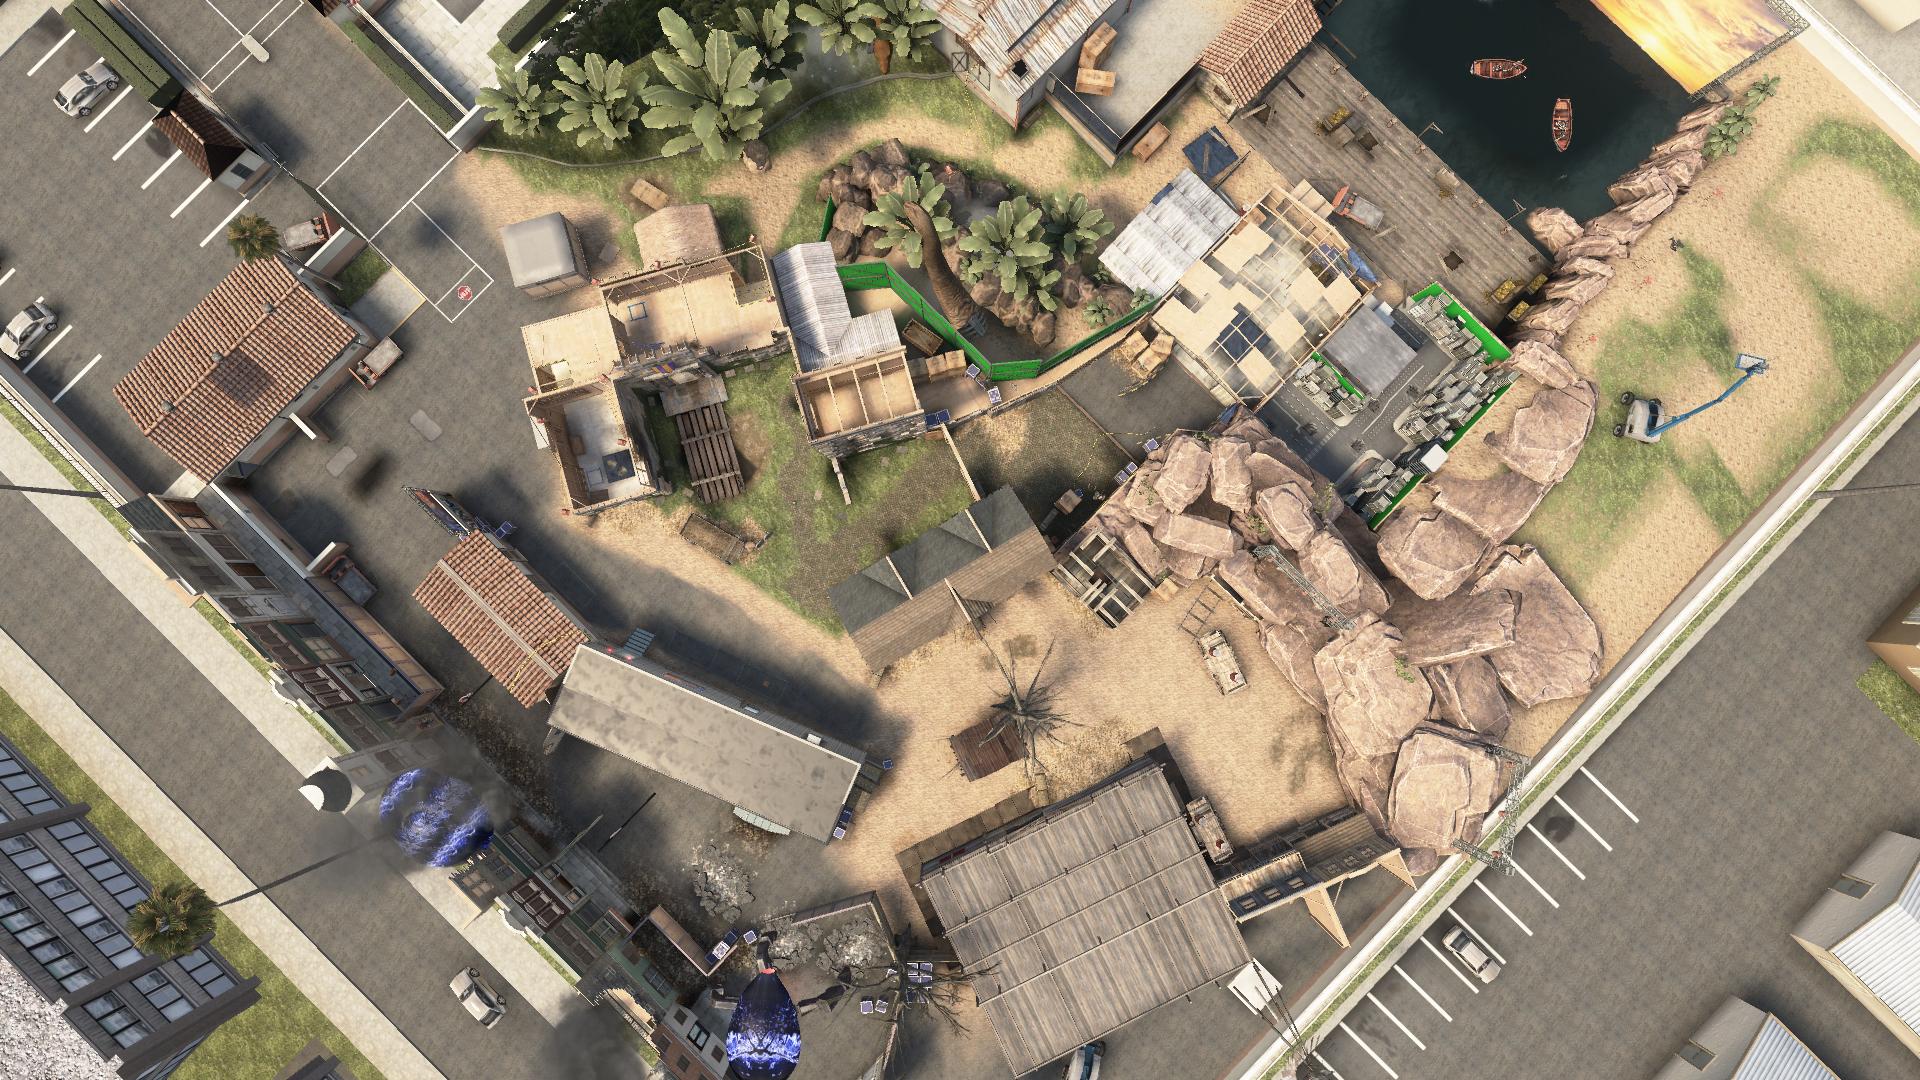 Studio_aerial_view_BOII.png